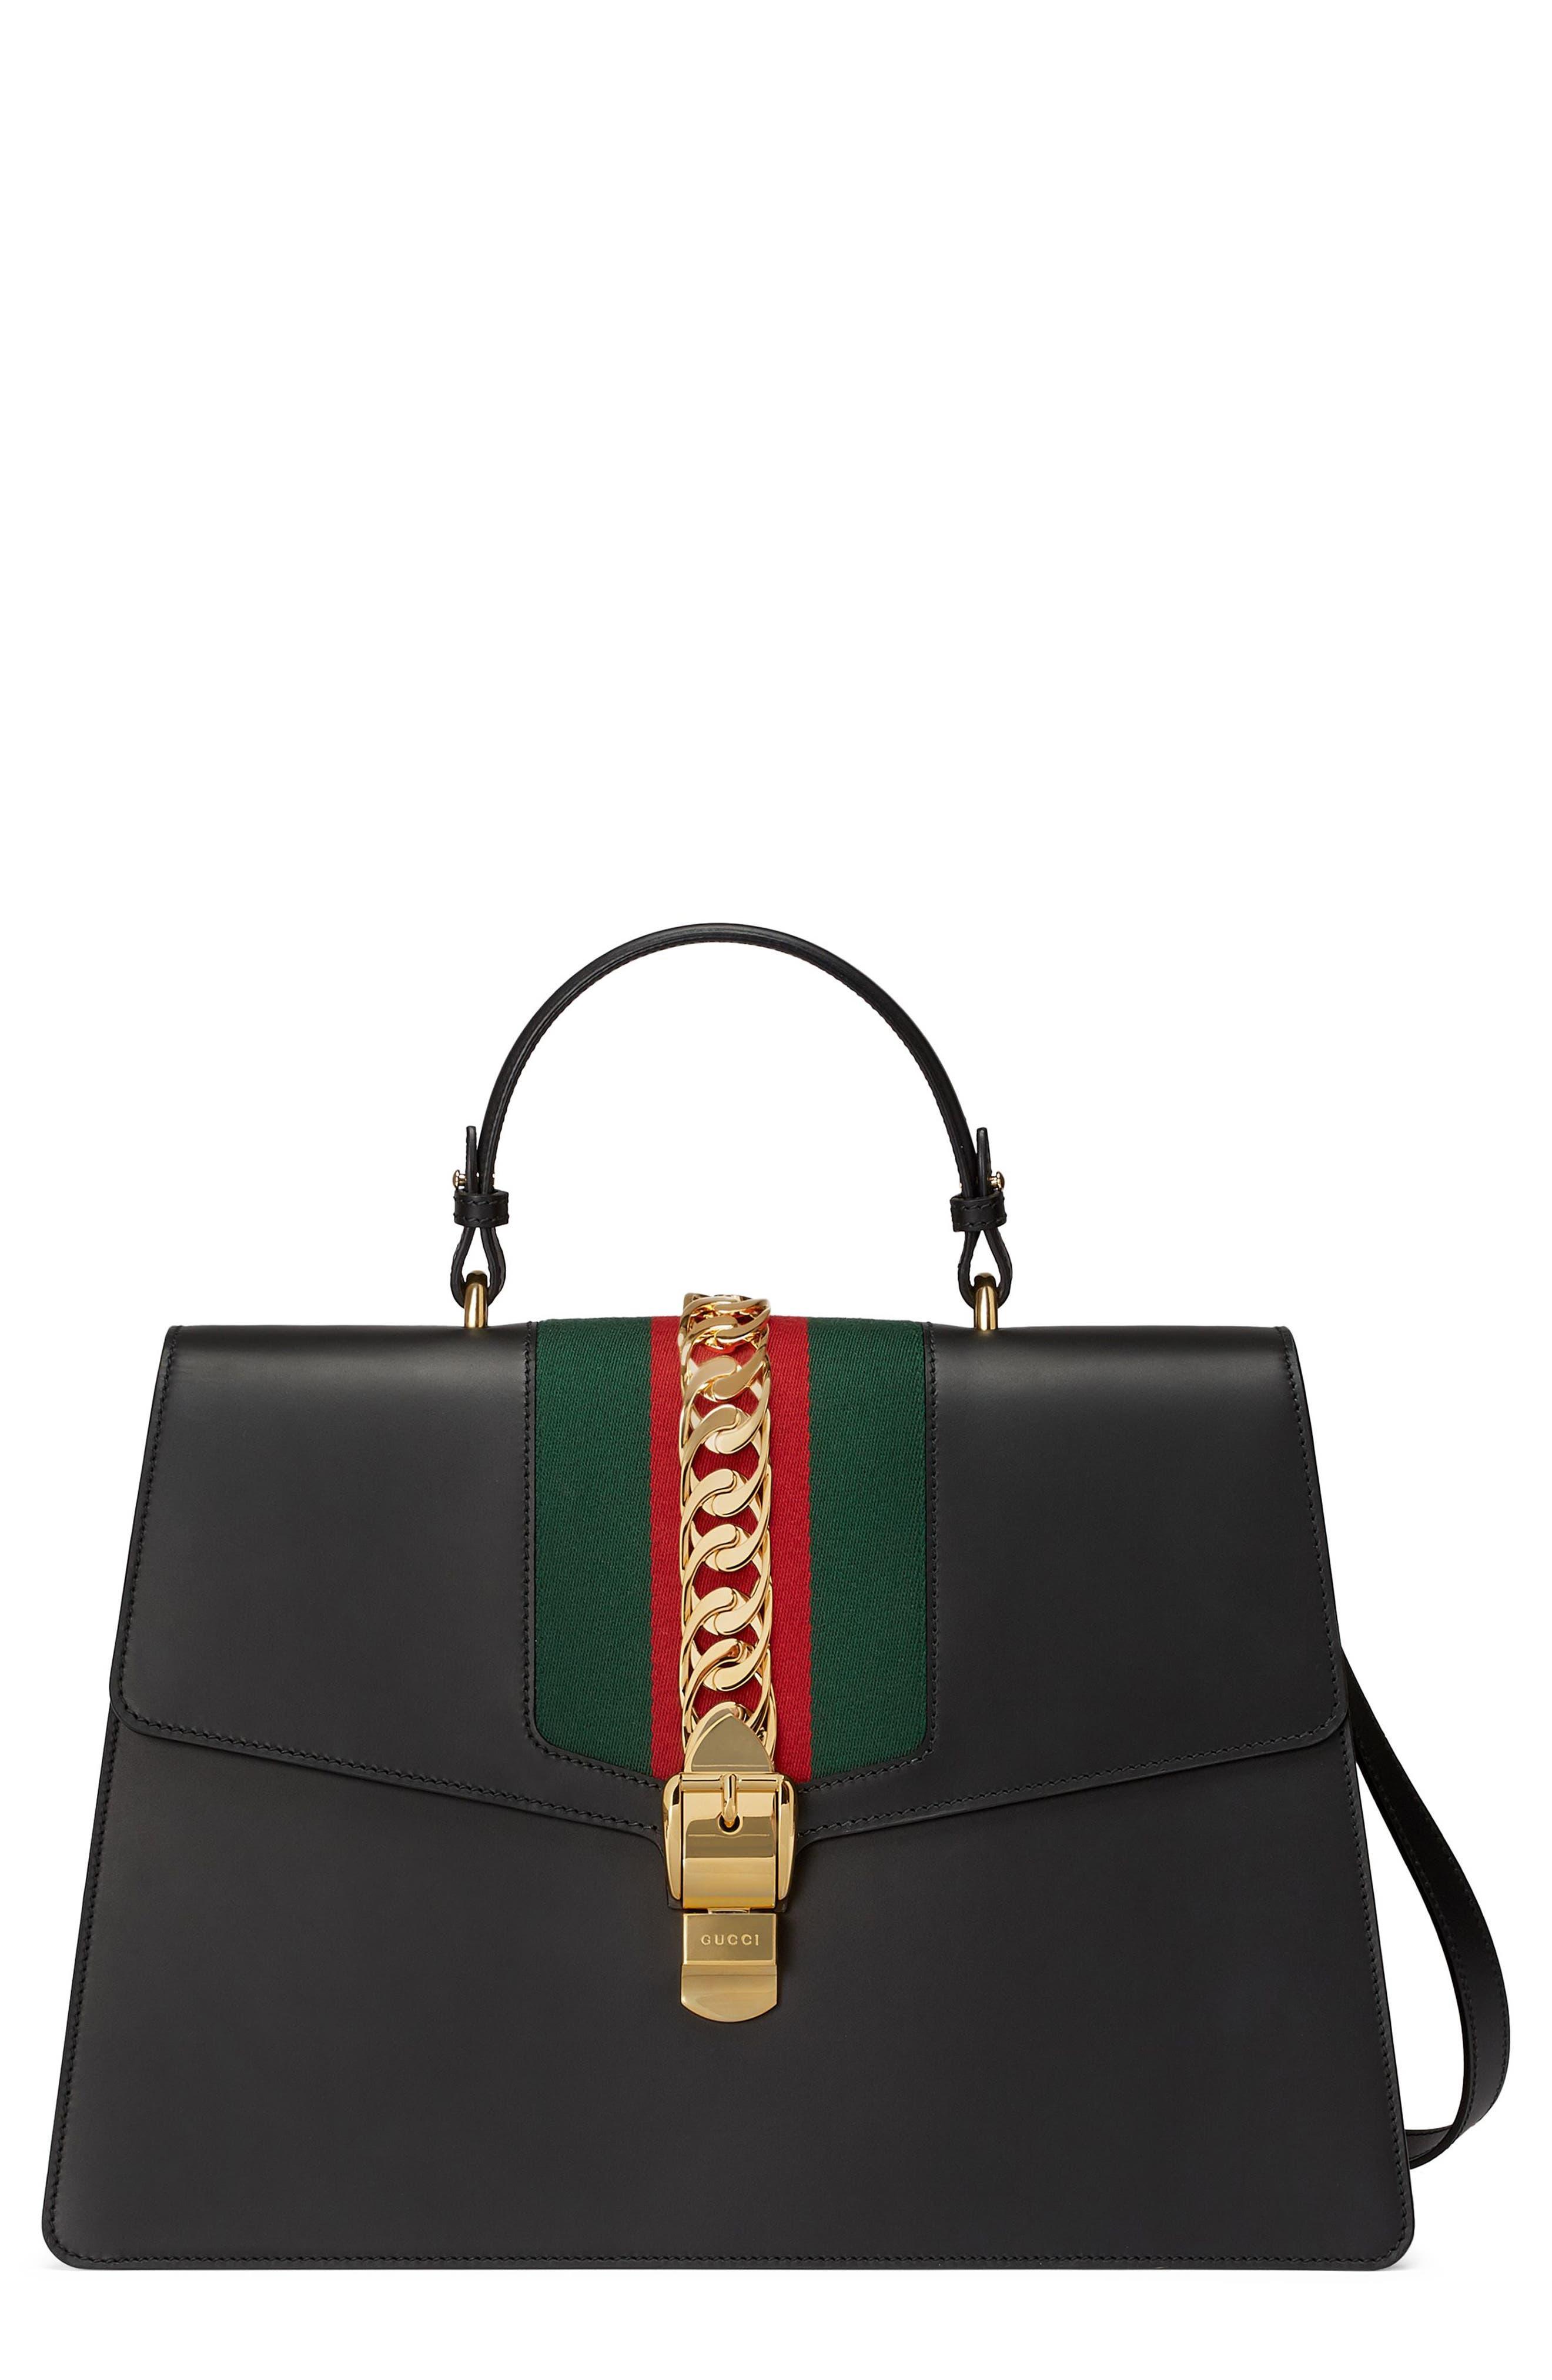 Maxi Sylvie Top Handle Leather Shoulder Bag,                             Main thumbnail 1, color,                             NERO/ VERT RED